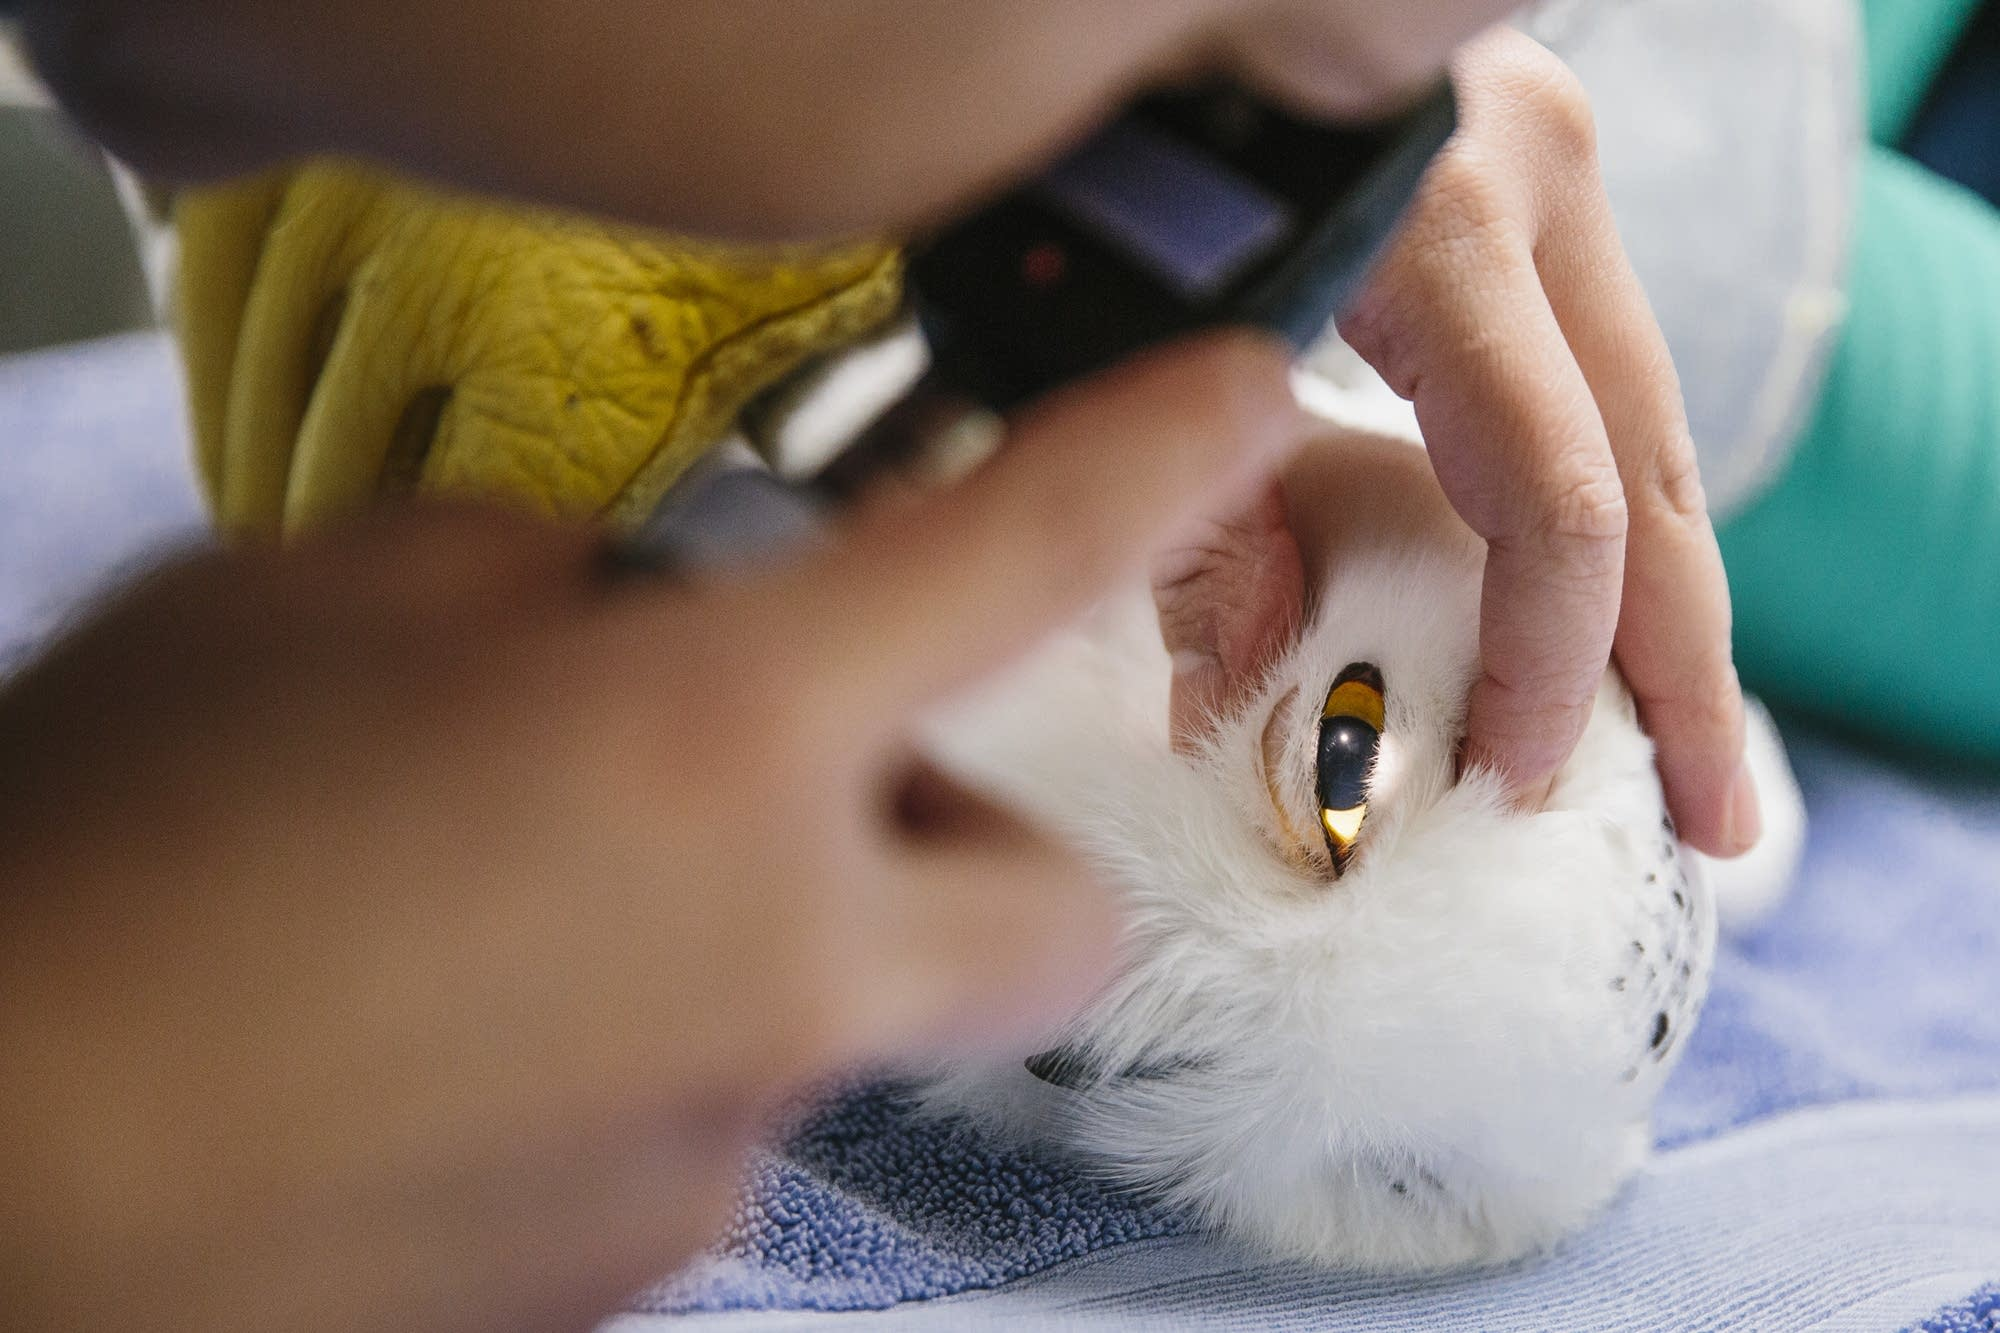 An intern checks a snowy owl's eye.